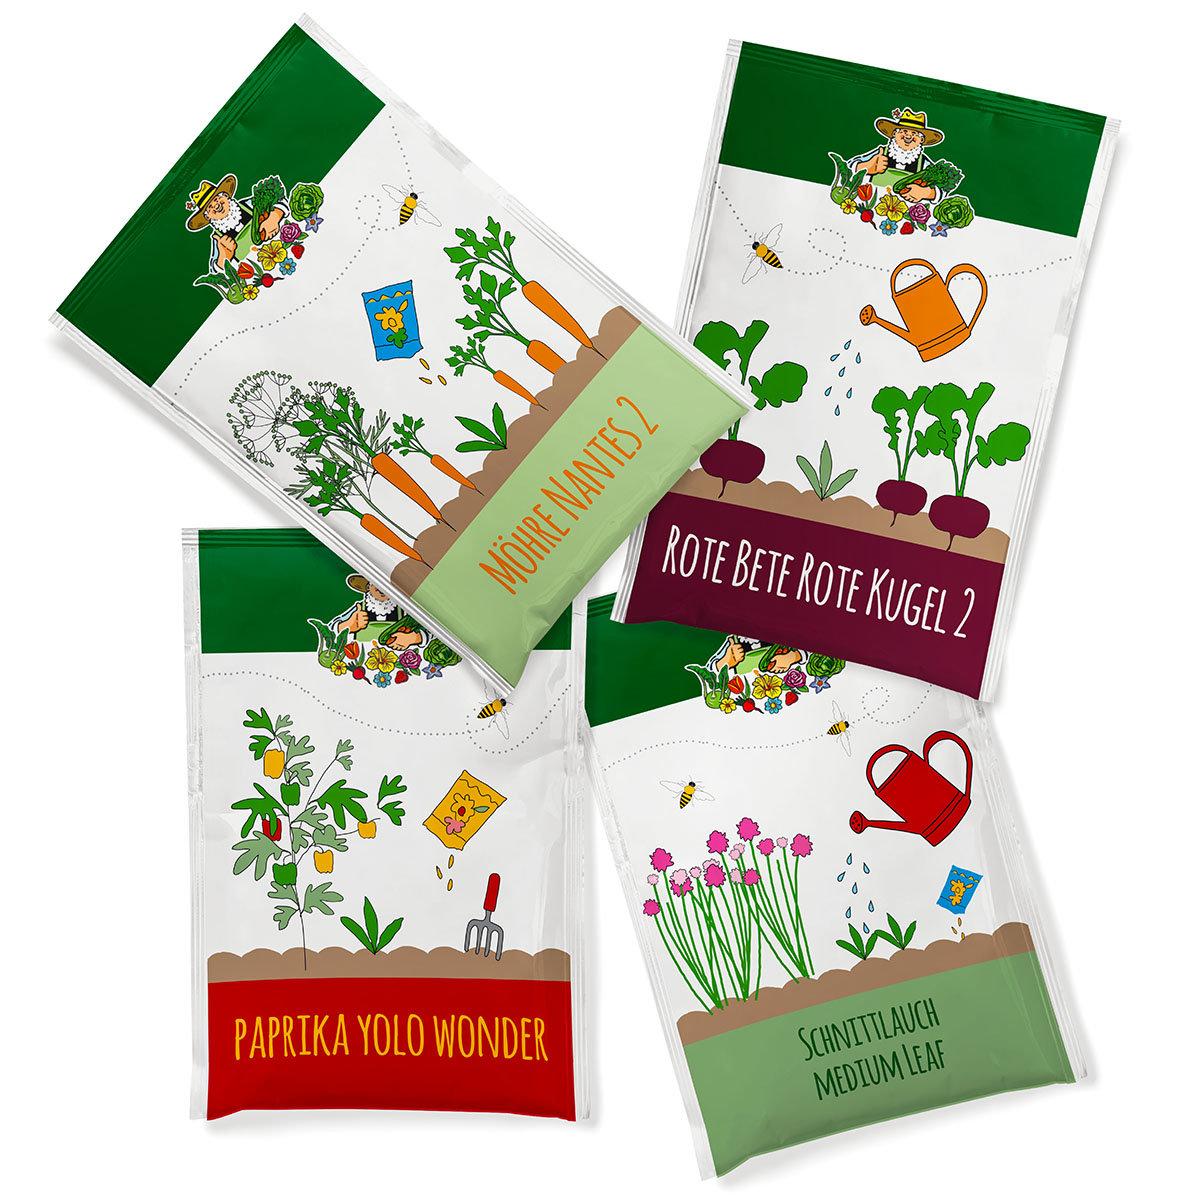 Saatgut-Adventskalender Kräuter & Gemüse | #2